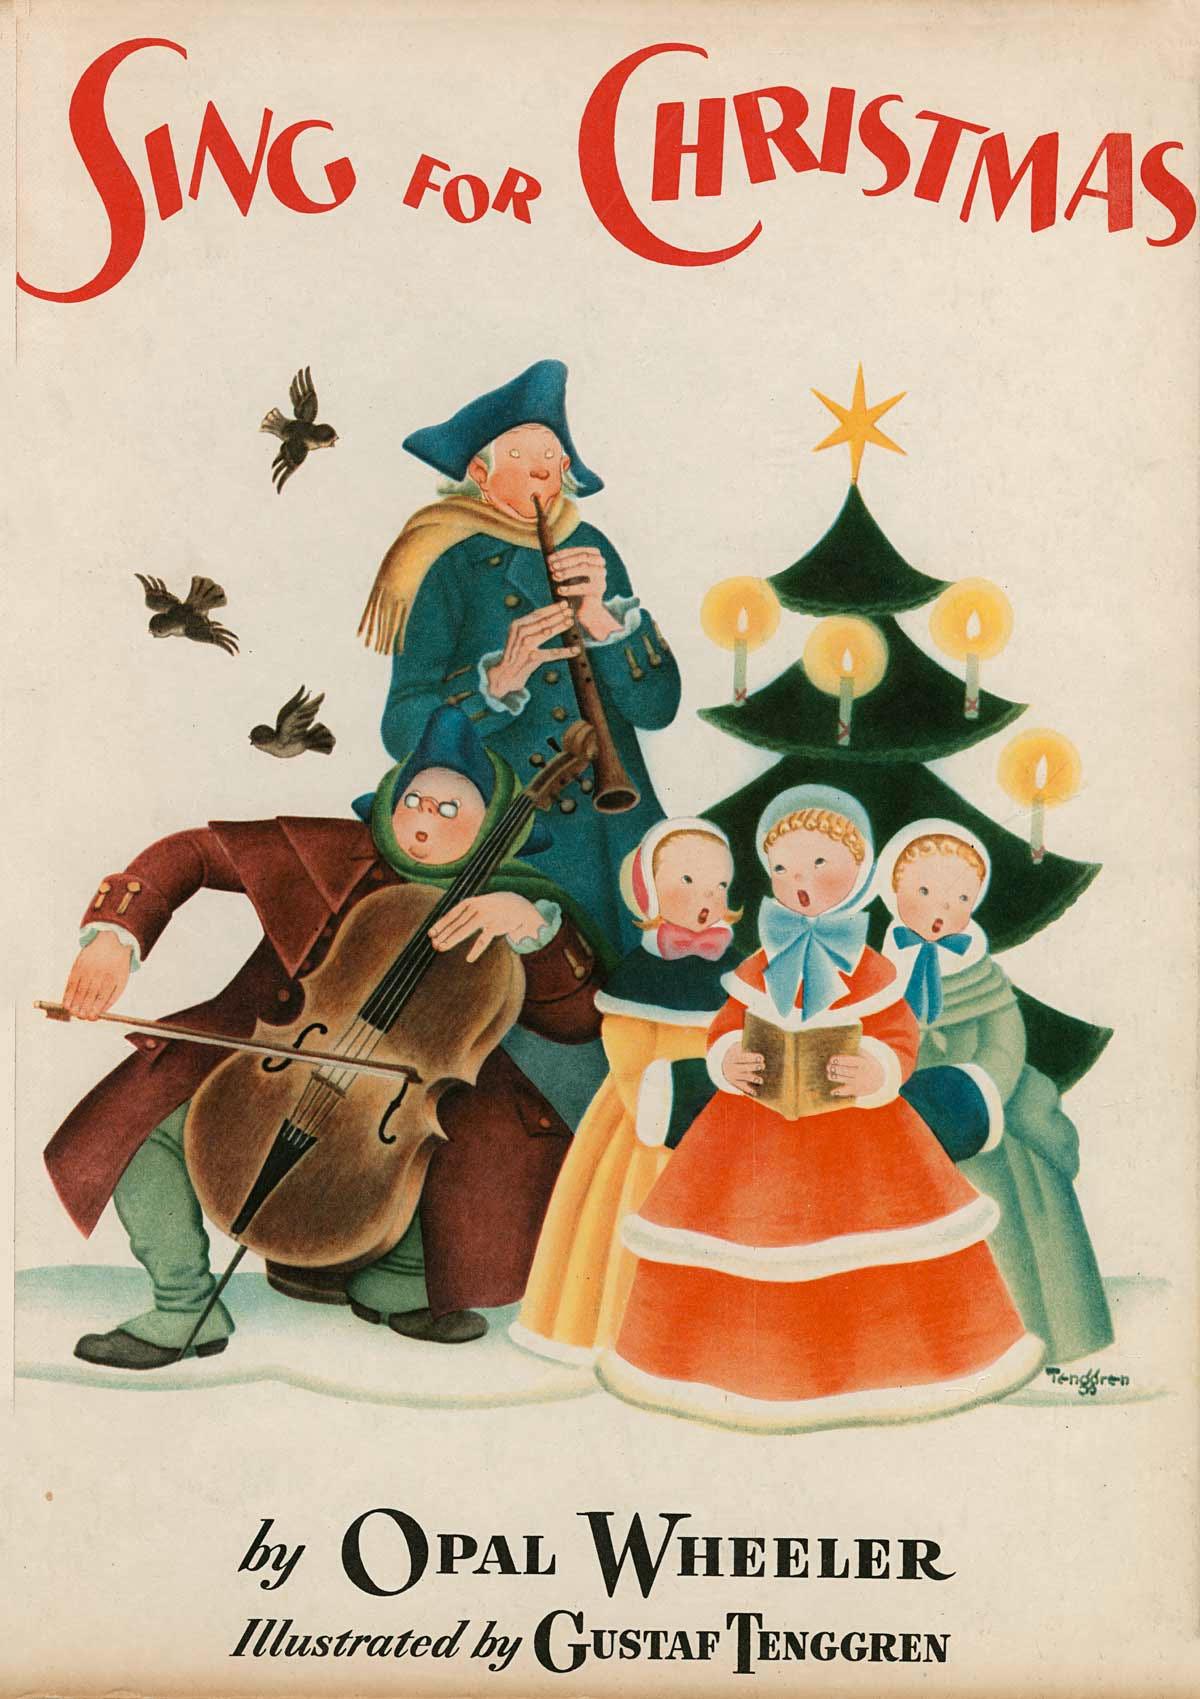 Gustaf Adolf Tenggren - Sing for Christmas